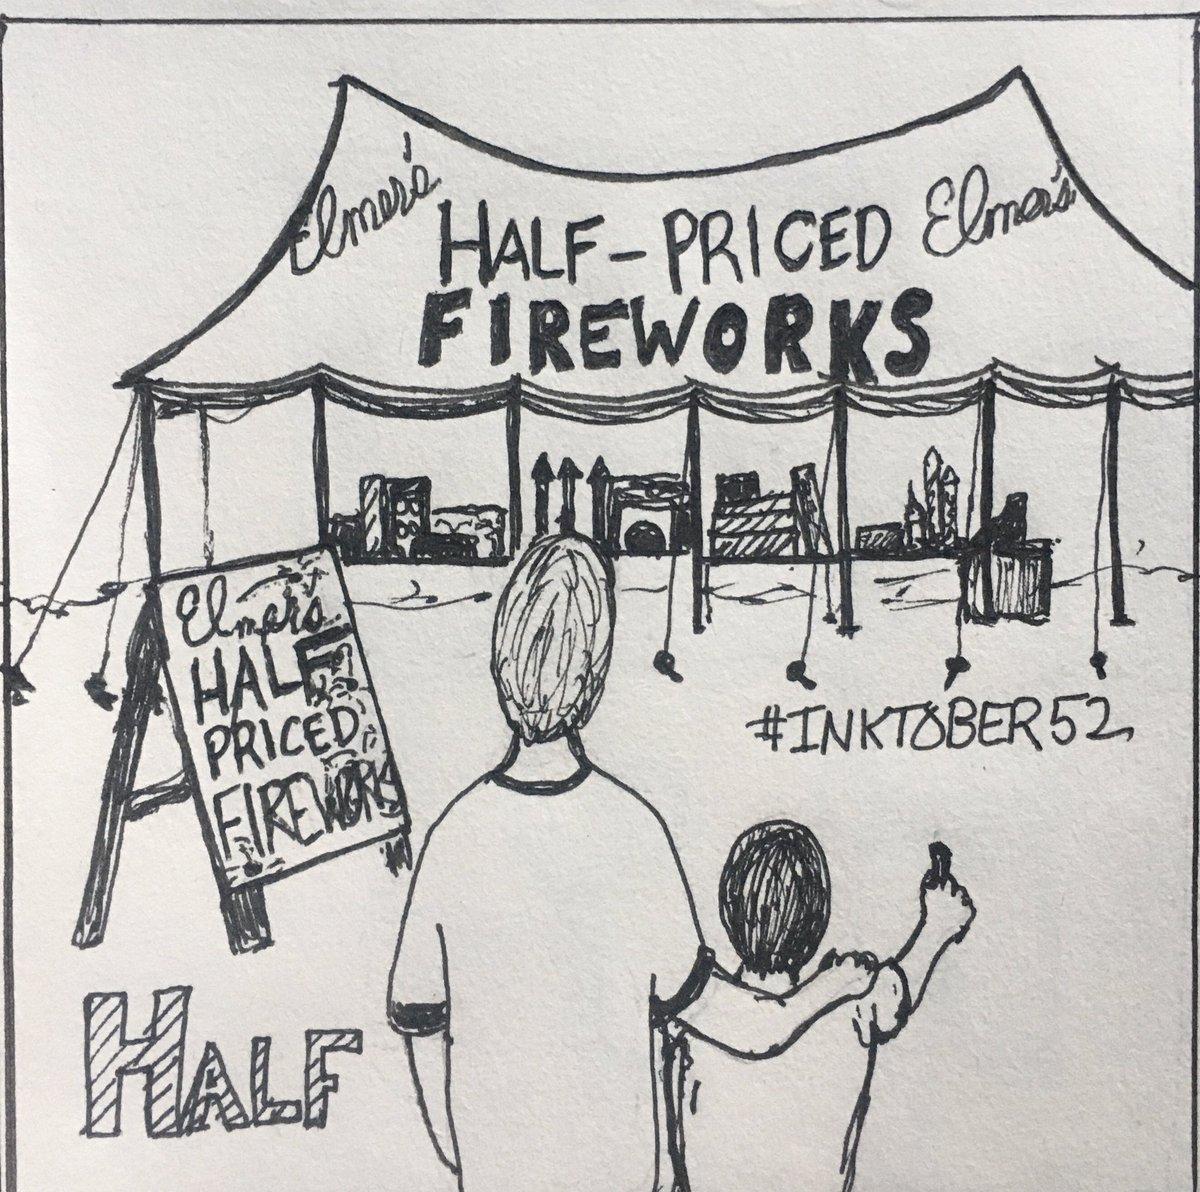 #Inktober52 Half. Half-priced fireworks are the bomb! #Inktober pic.twitter.com/ljOZ0Ye2Ma